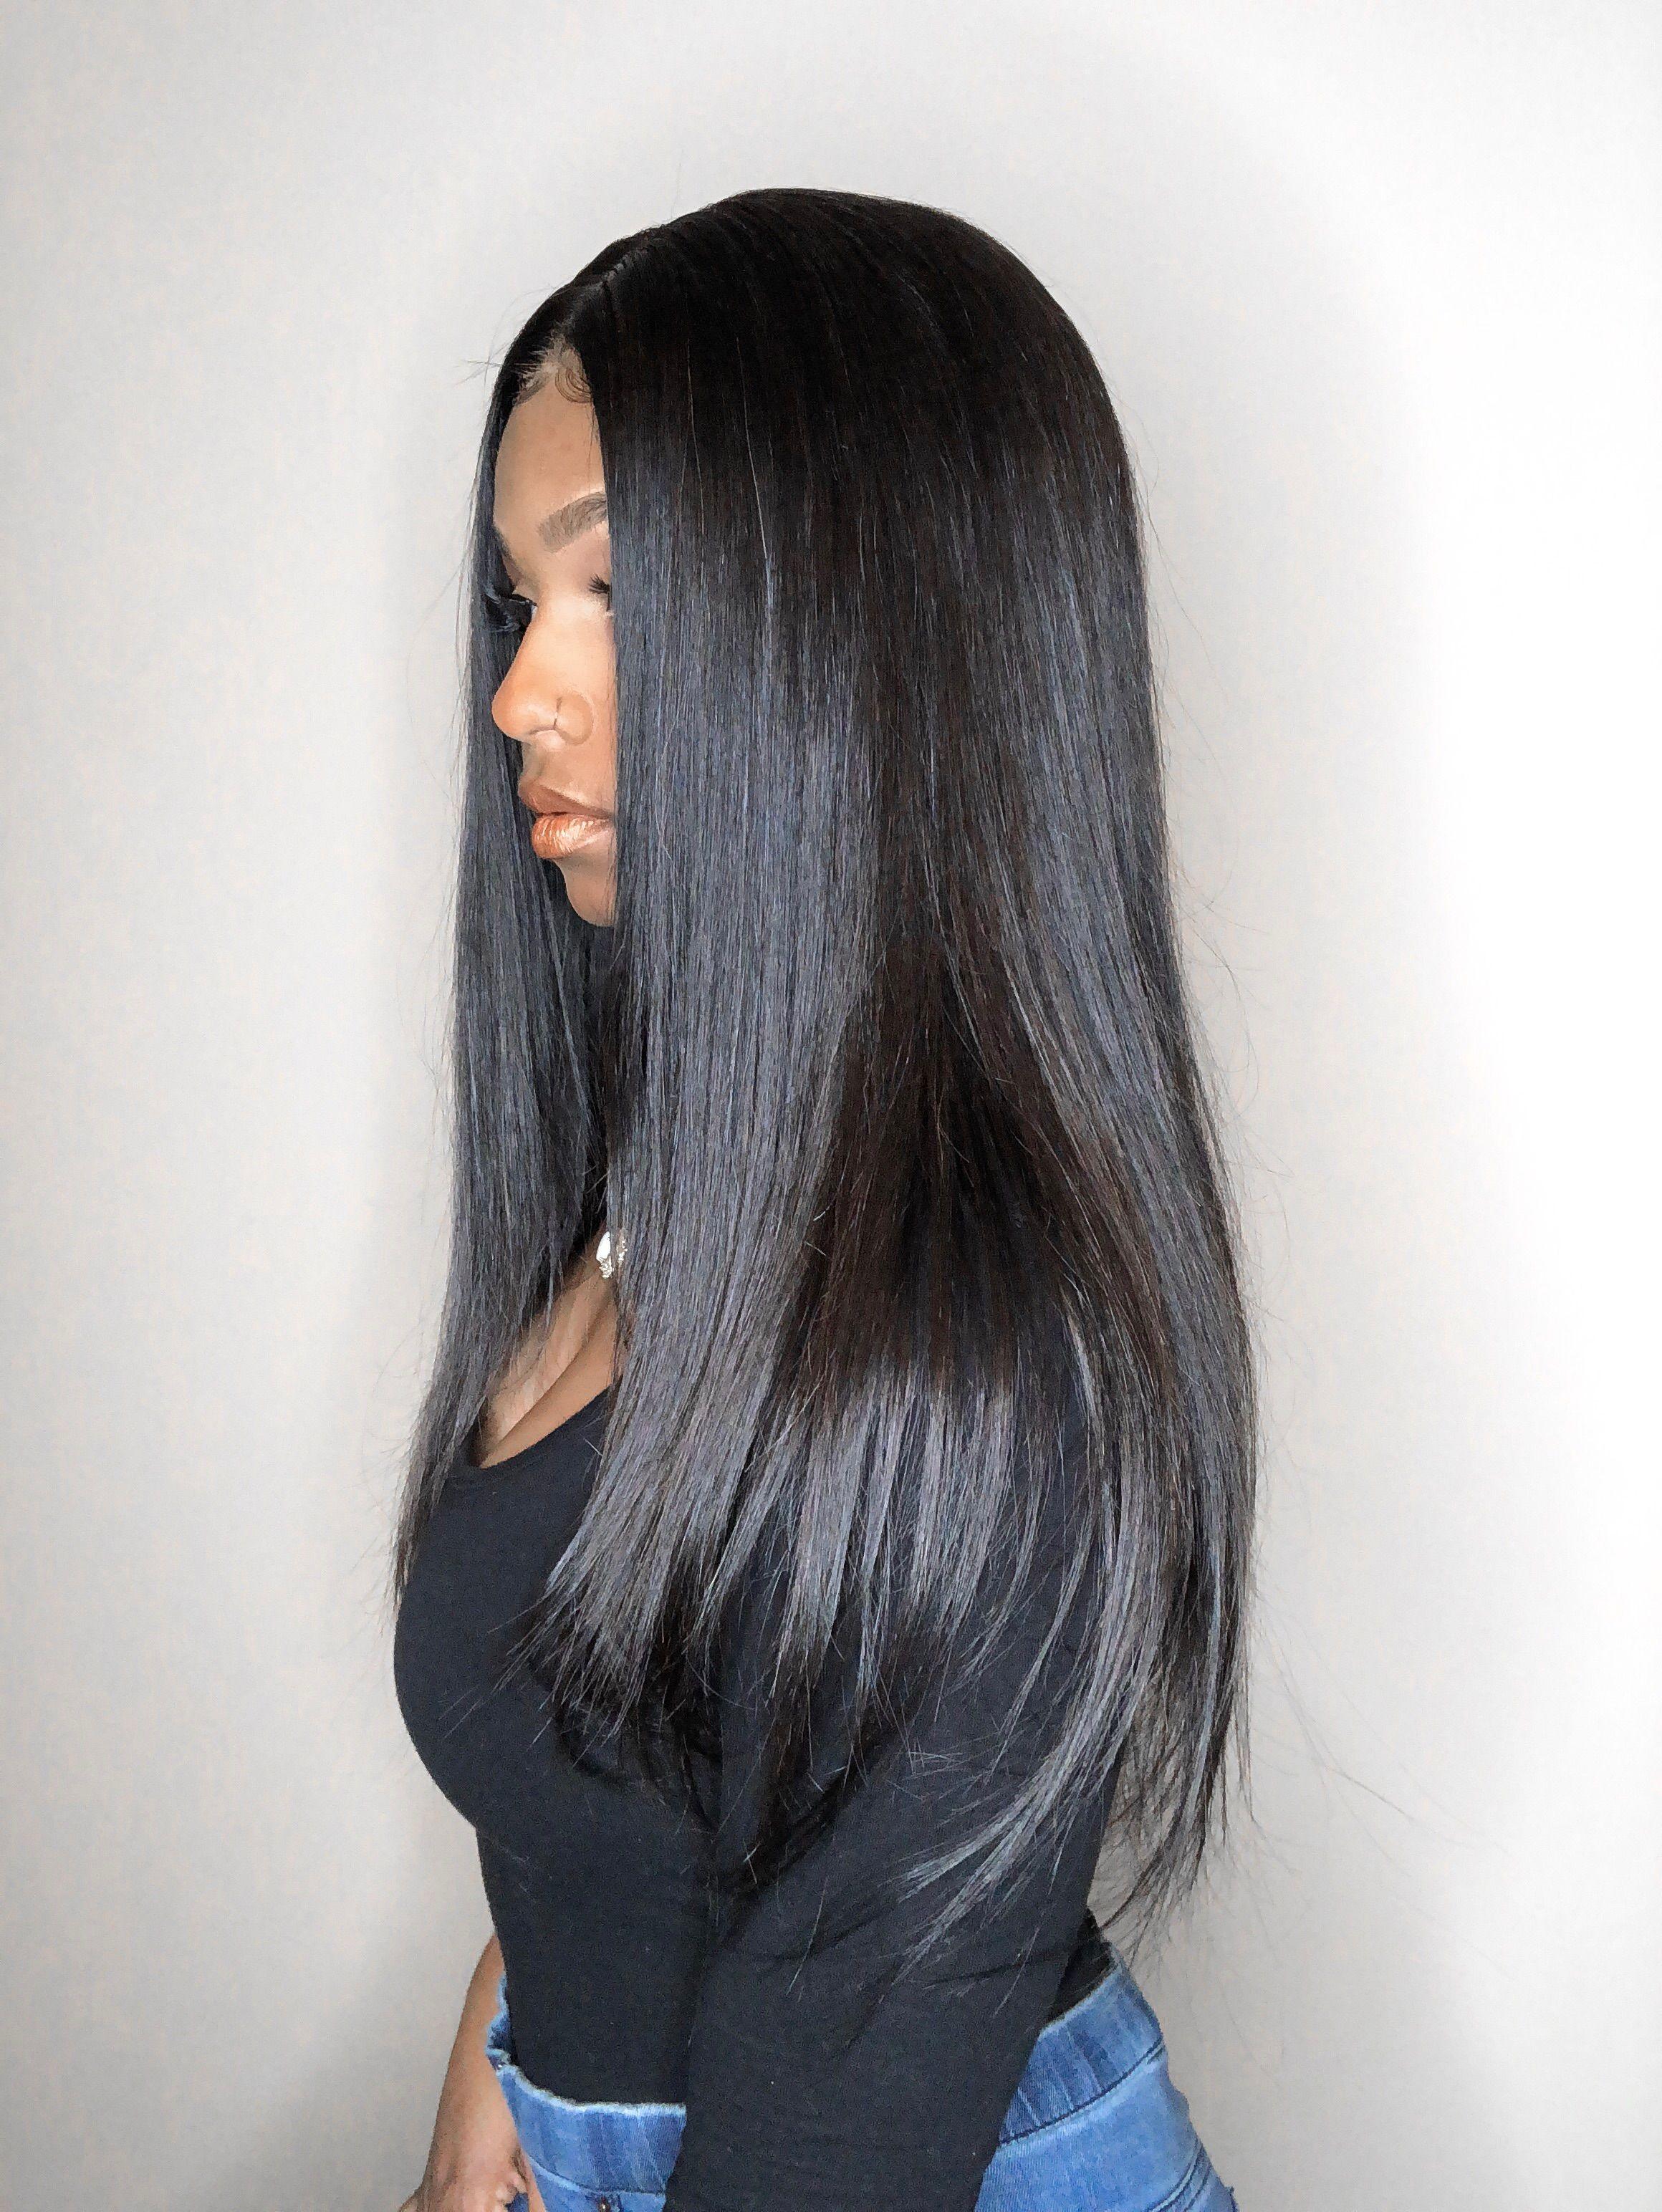 Vietnamese Straight Hair Extensions Straight Hairstyles Raw Hair Cambodian Hair